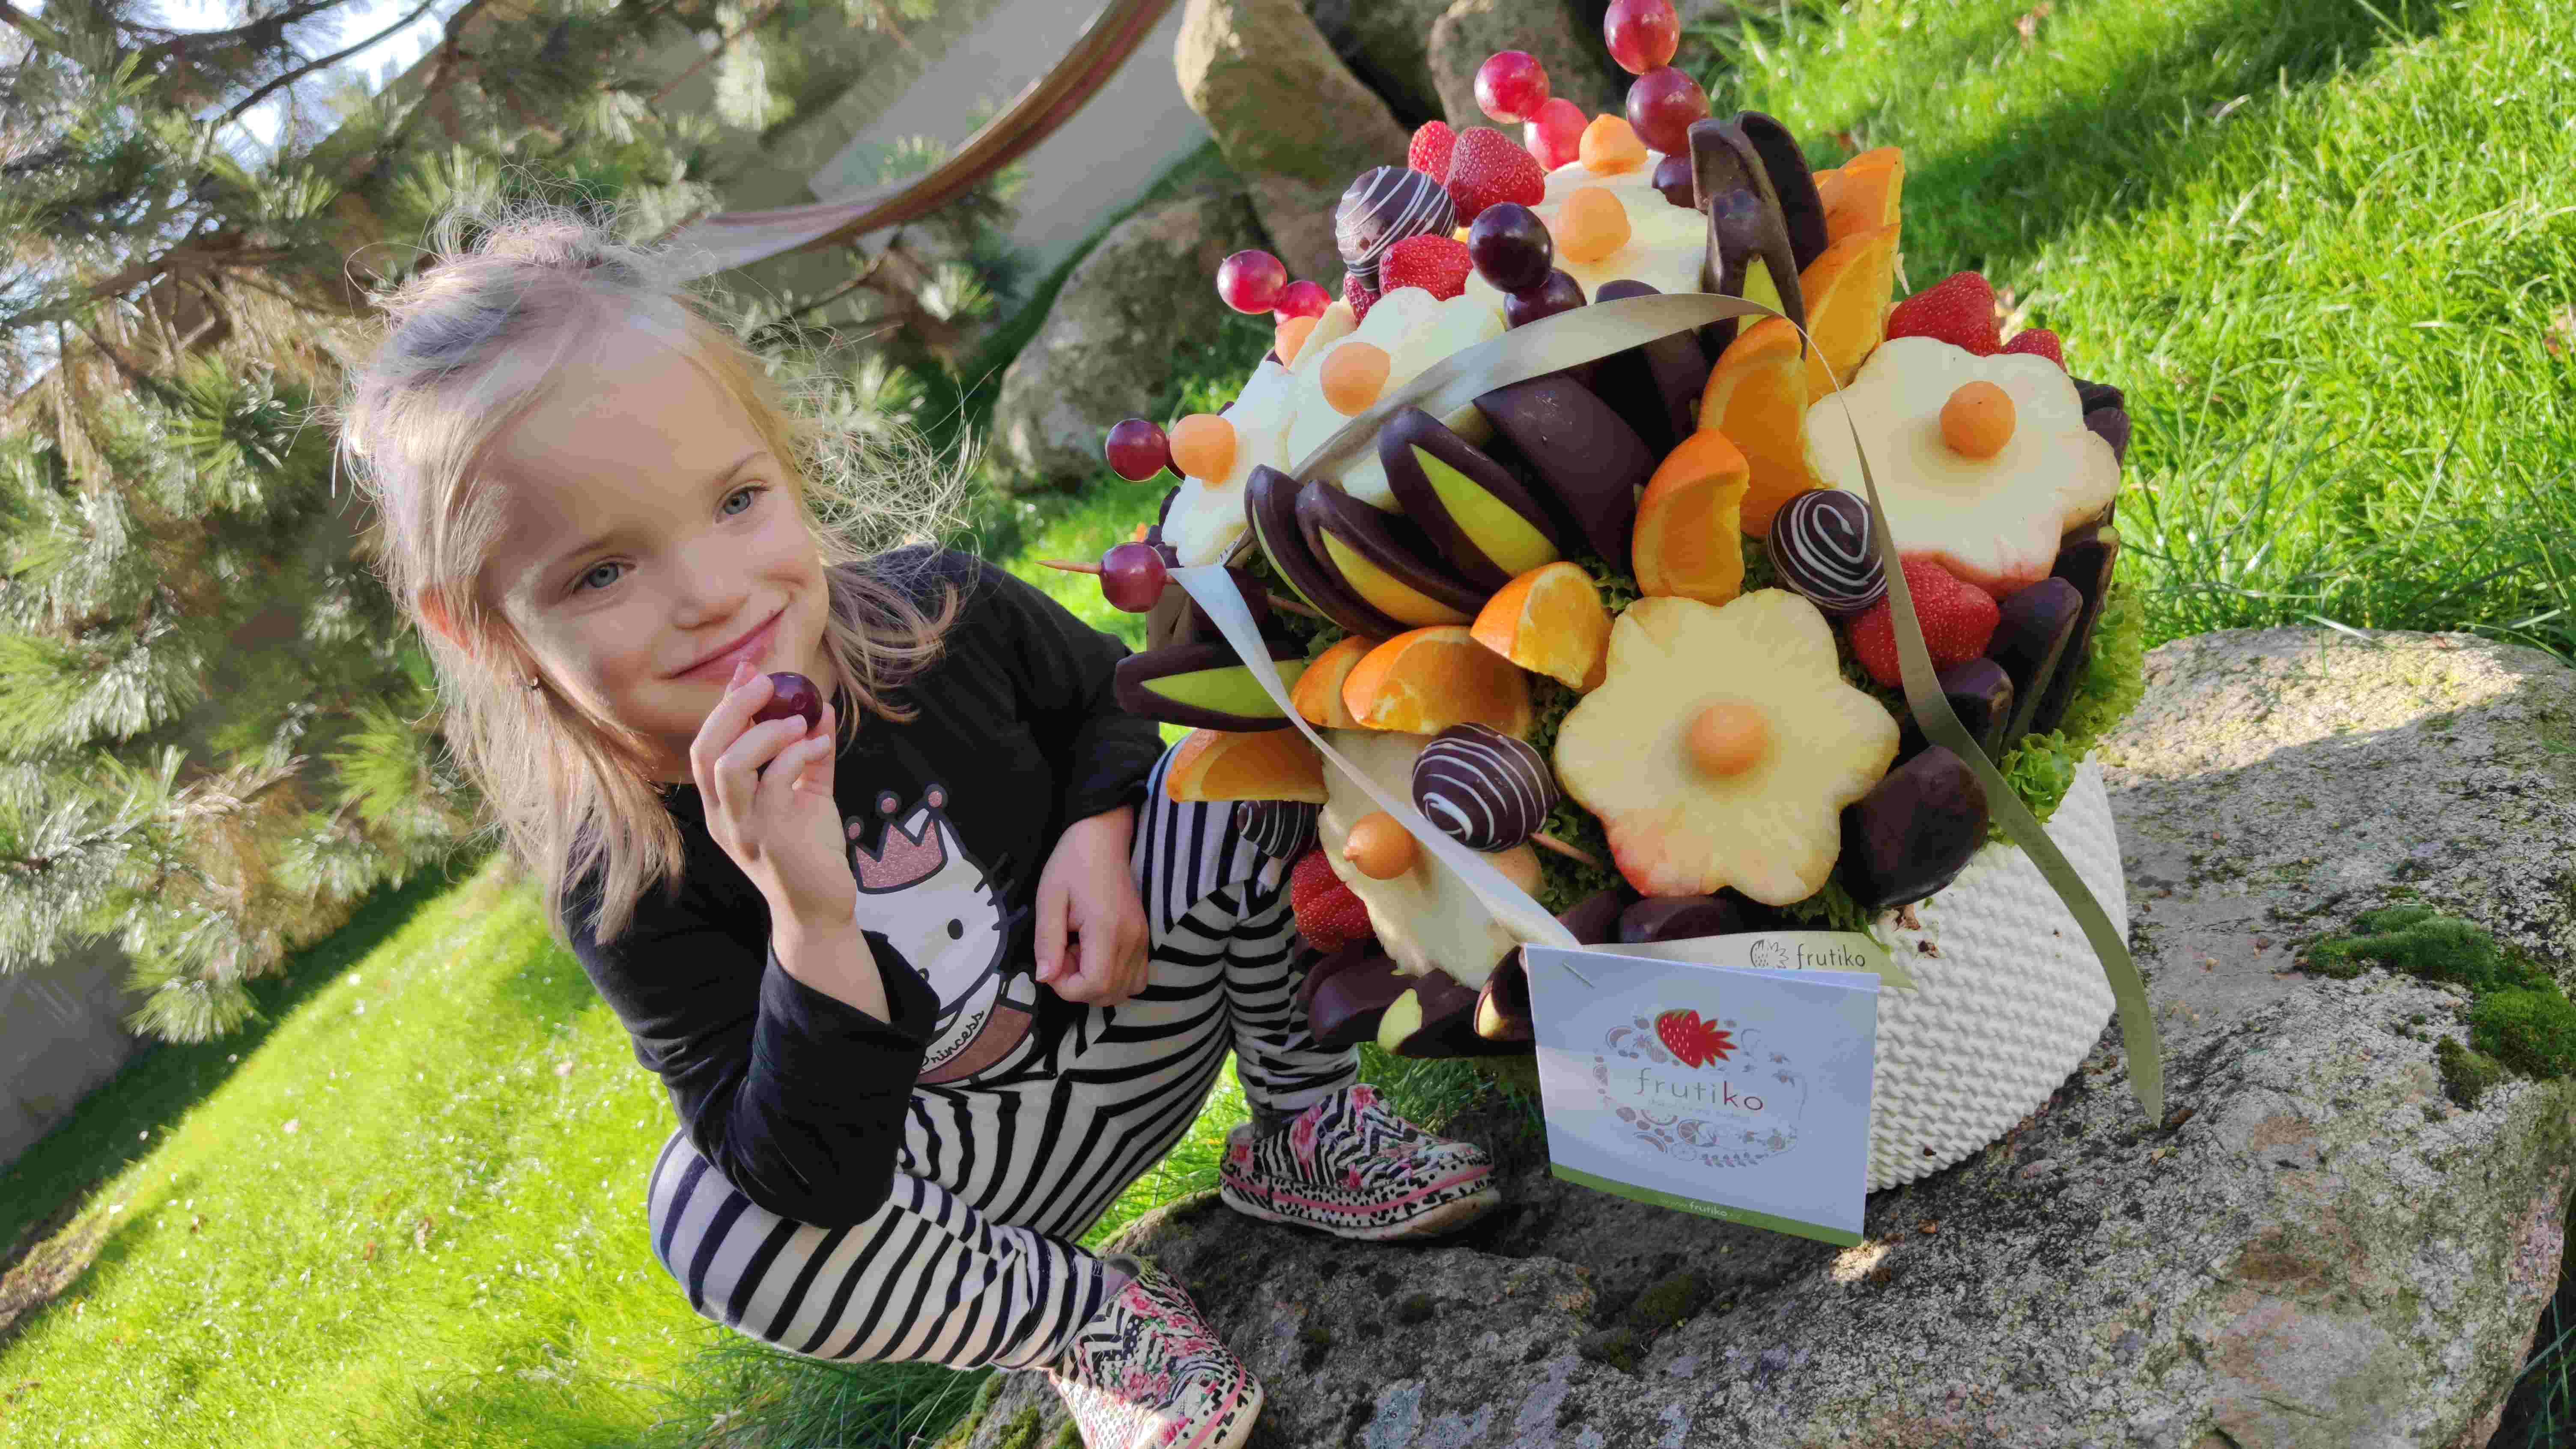 Recenze Frutiko: Jedlá kytice, ovocná kytice